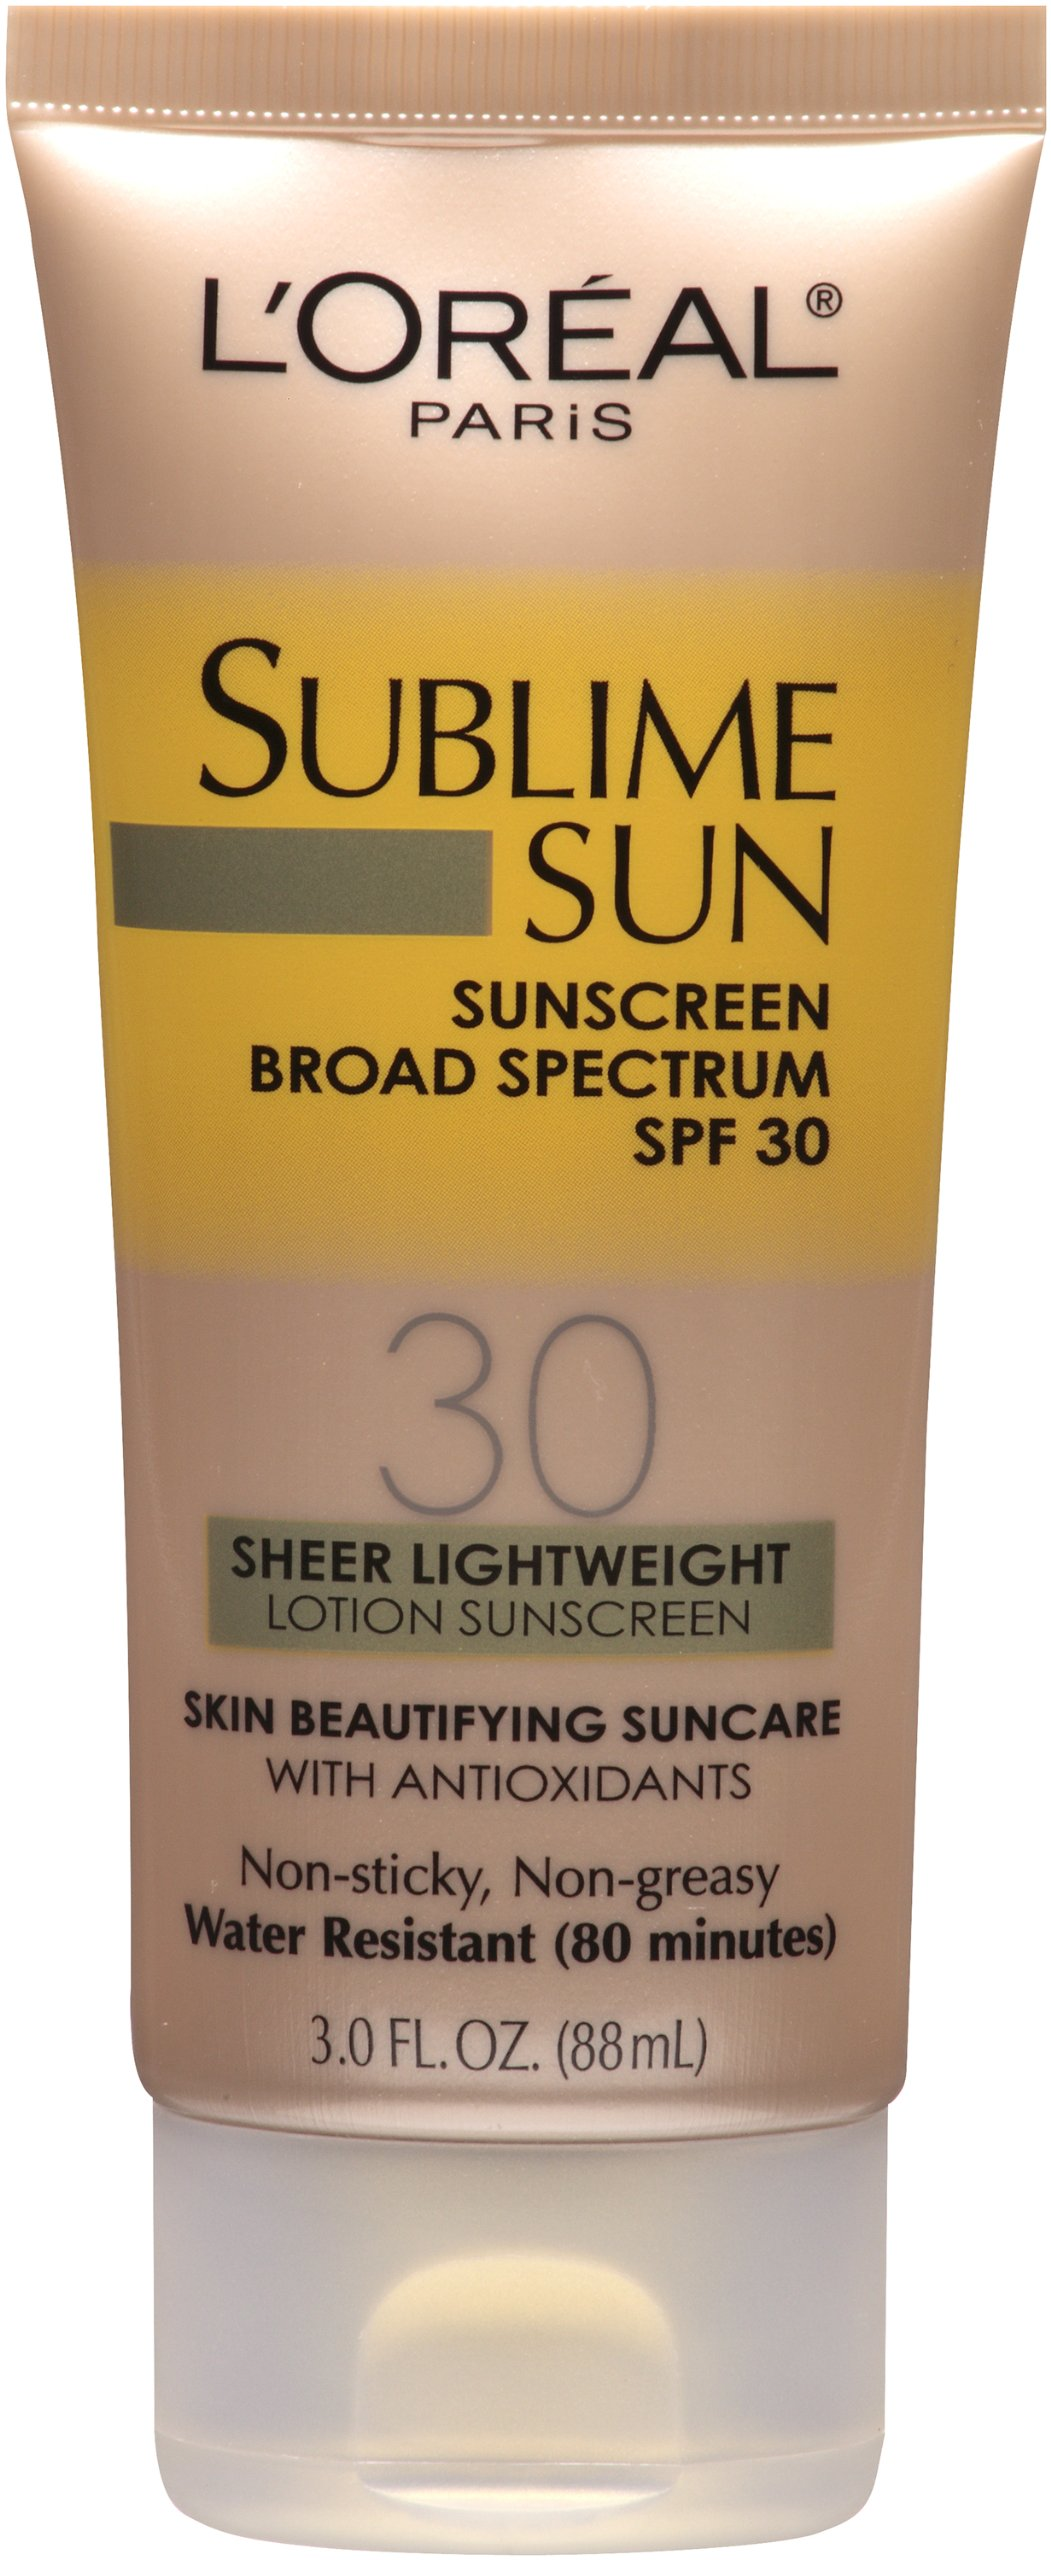 L'Oreal Paris Sublime Sun Advanced Sunscreen SPF 30 Lotion, 3.0 Ounce